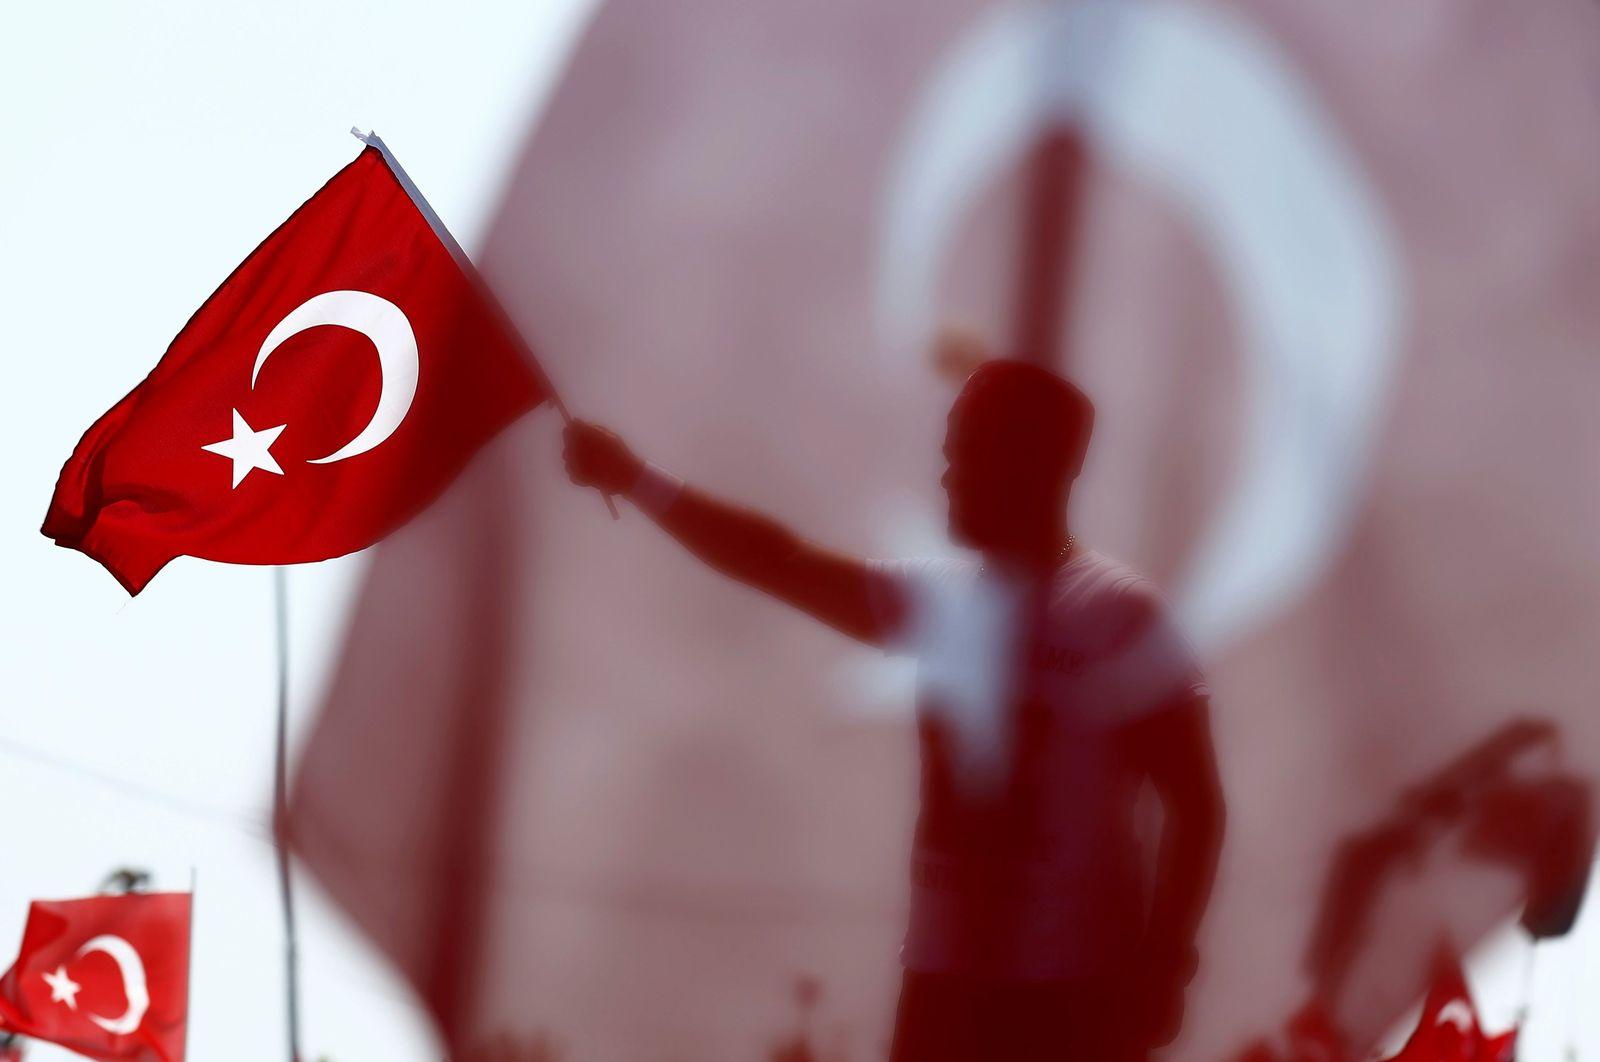 Türkei/ Istanbul/ Demonstration